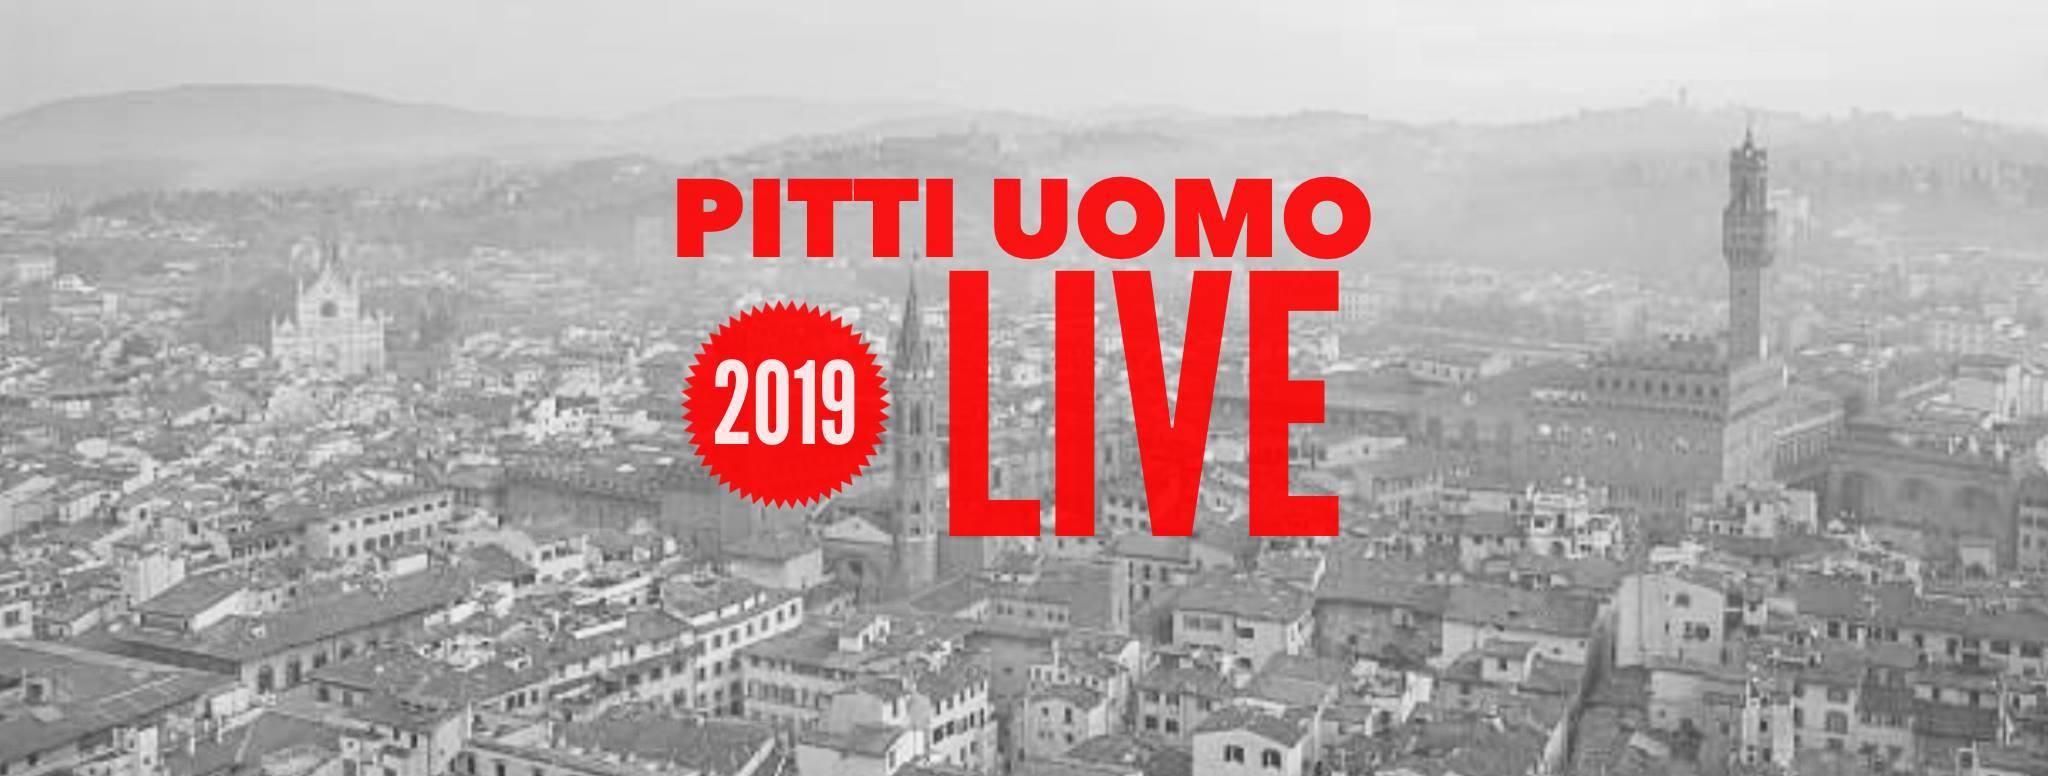 Pitti Uomo 2019 LIVE